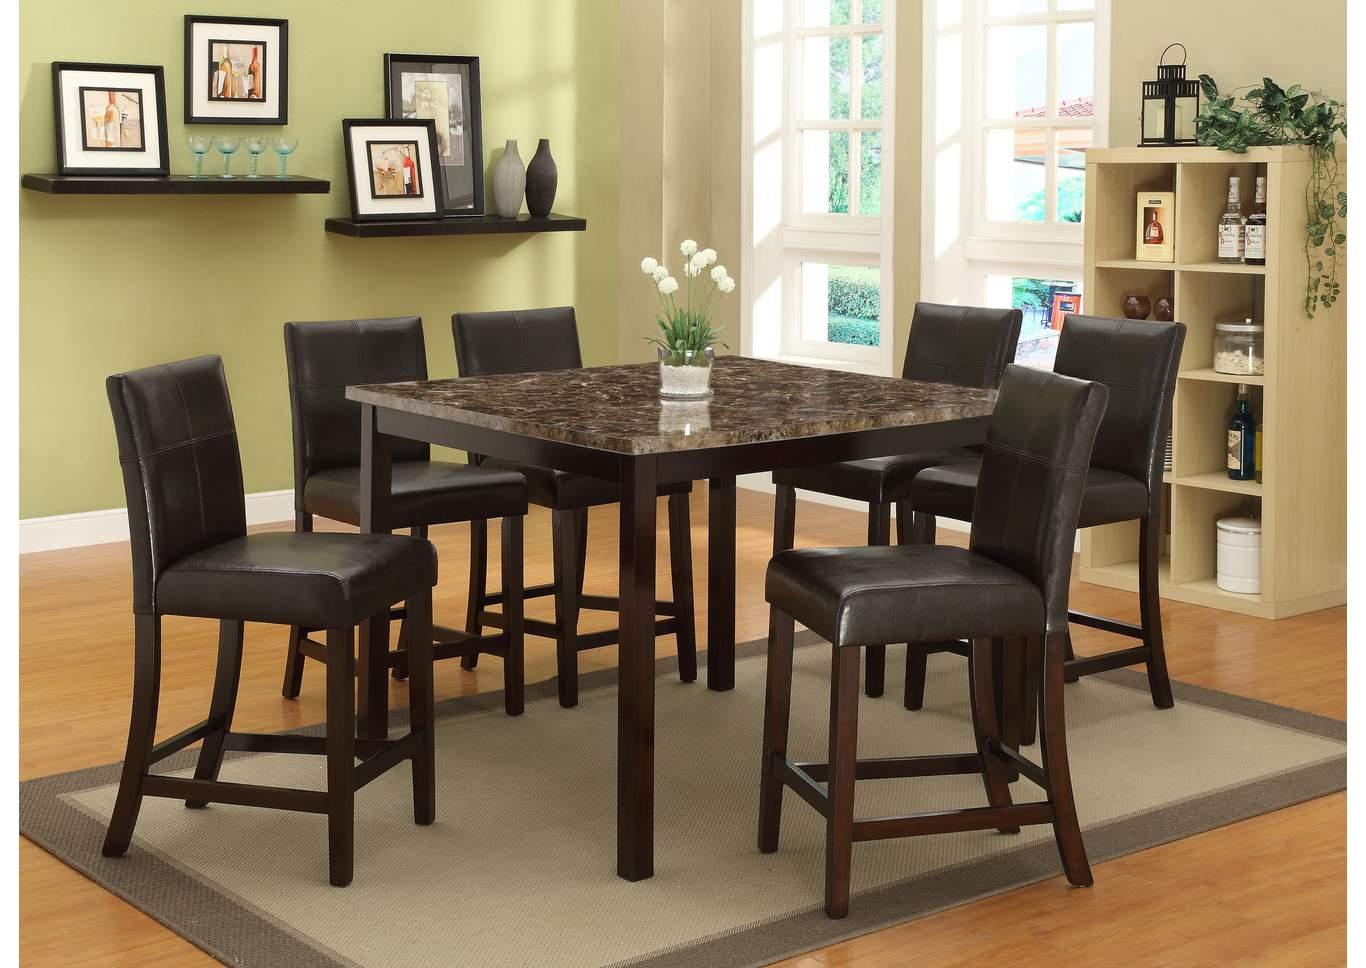 Roberts Furniture U0026 Mattress